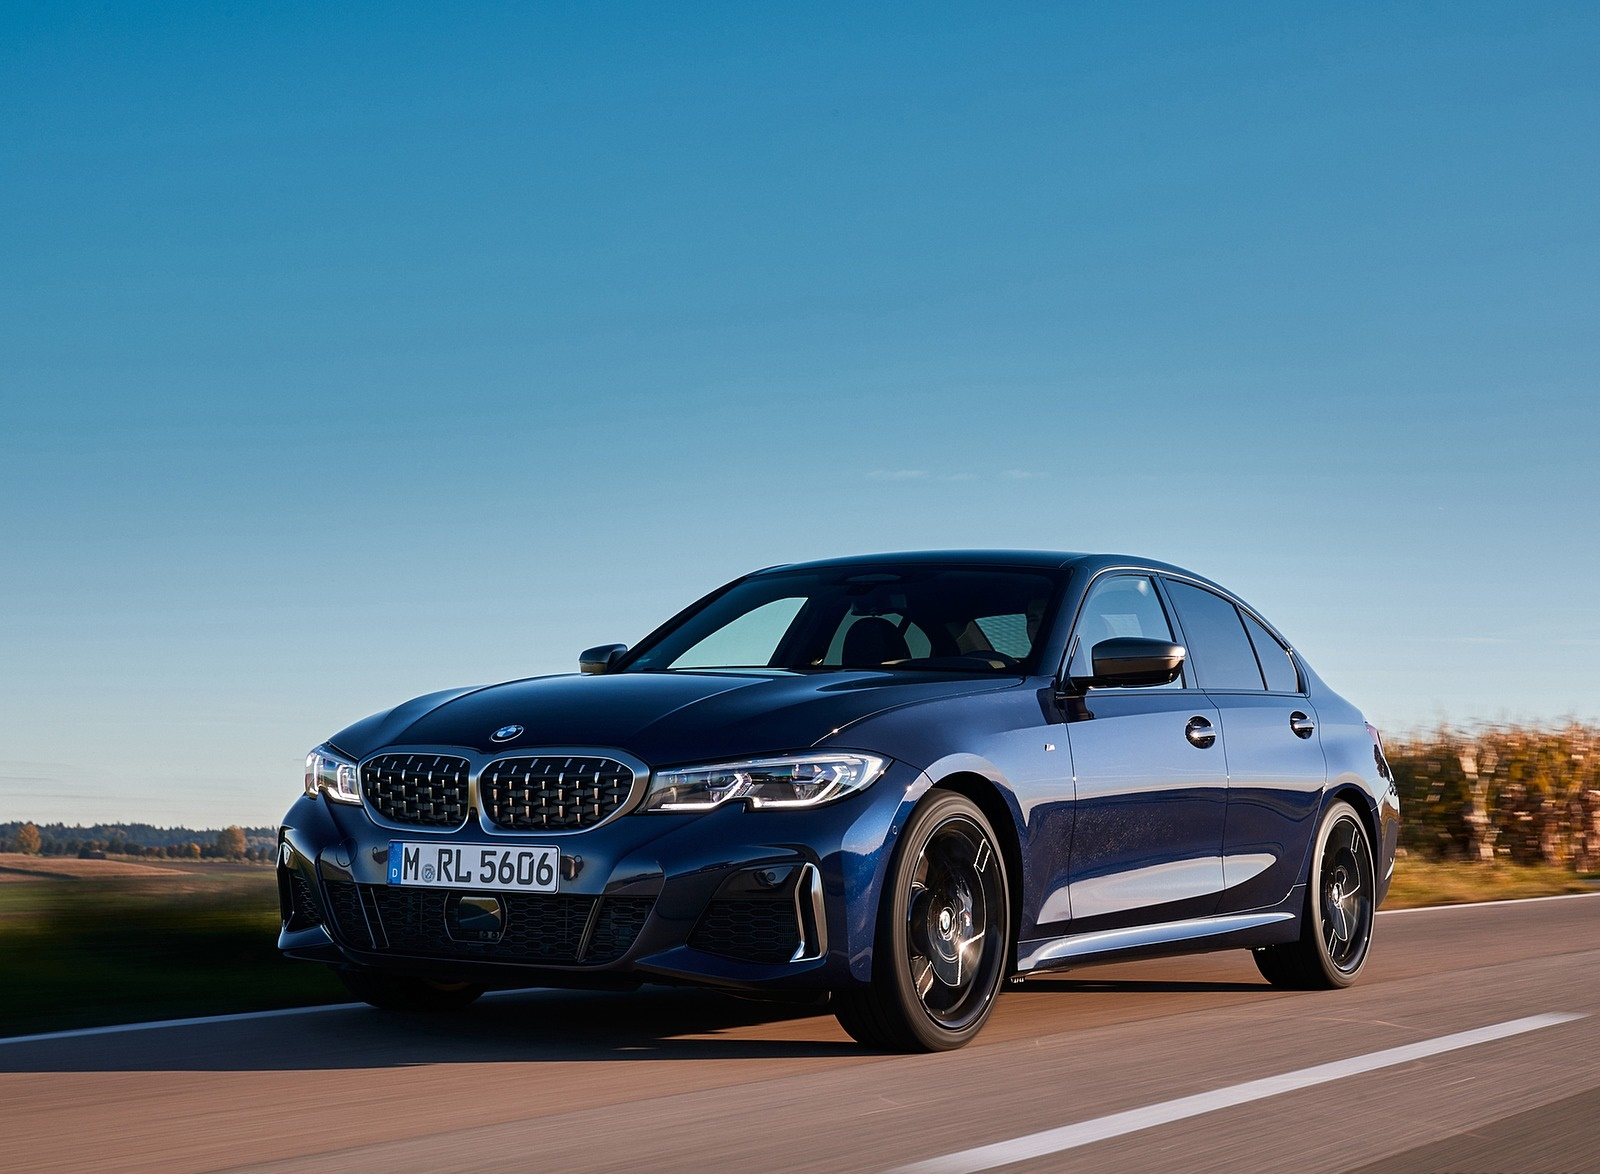 2020 BMW M340i Sedan (Color: Tanzanite Blue Metallic) Front Three-Quarter Wallpapers #8 of 74